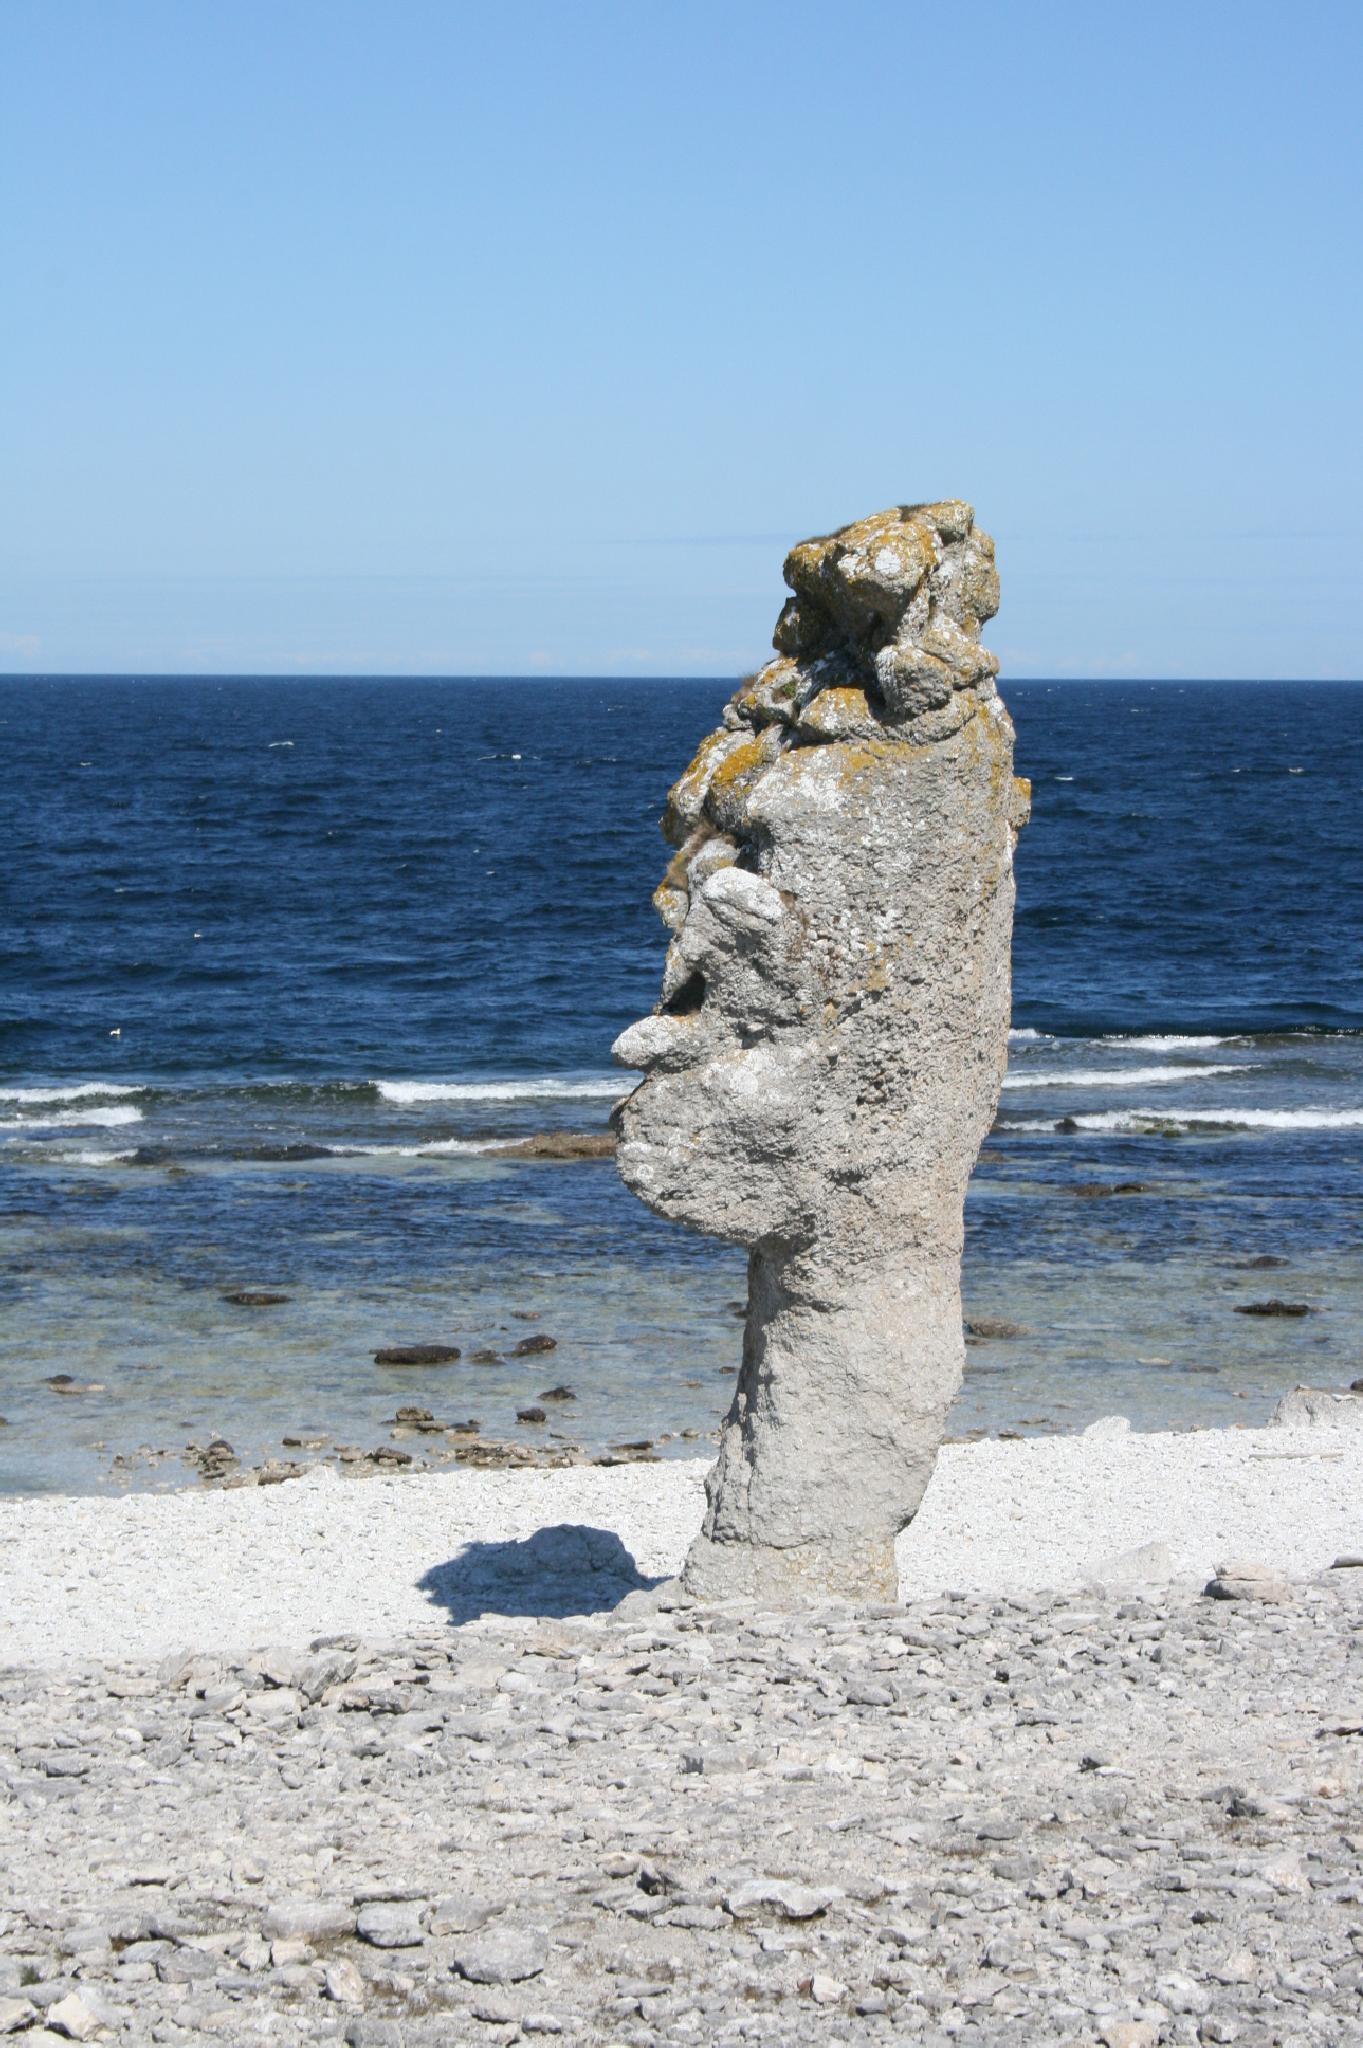 Rauk at Gotland by olofmarkusandersson